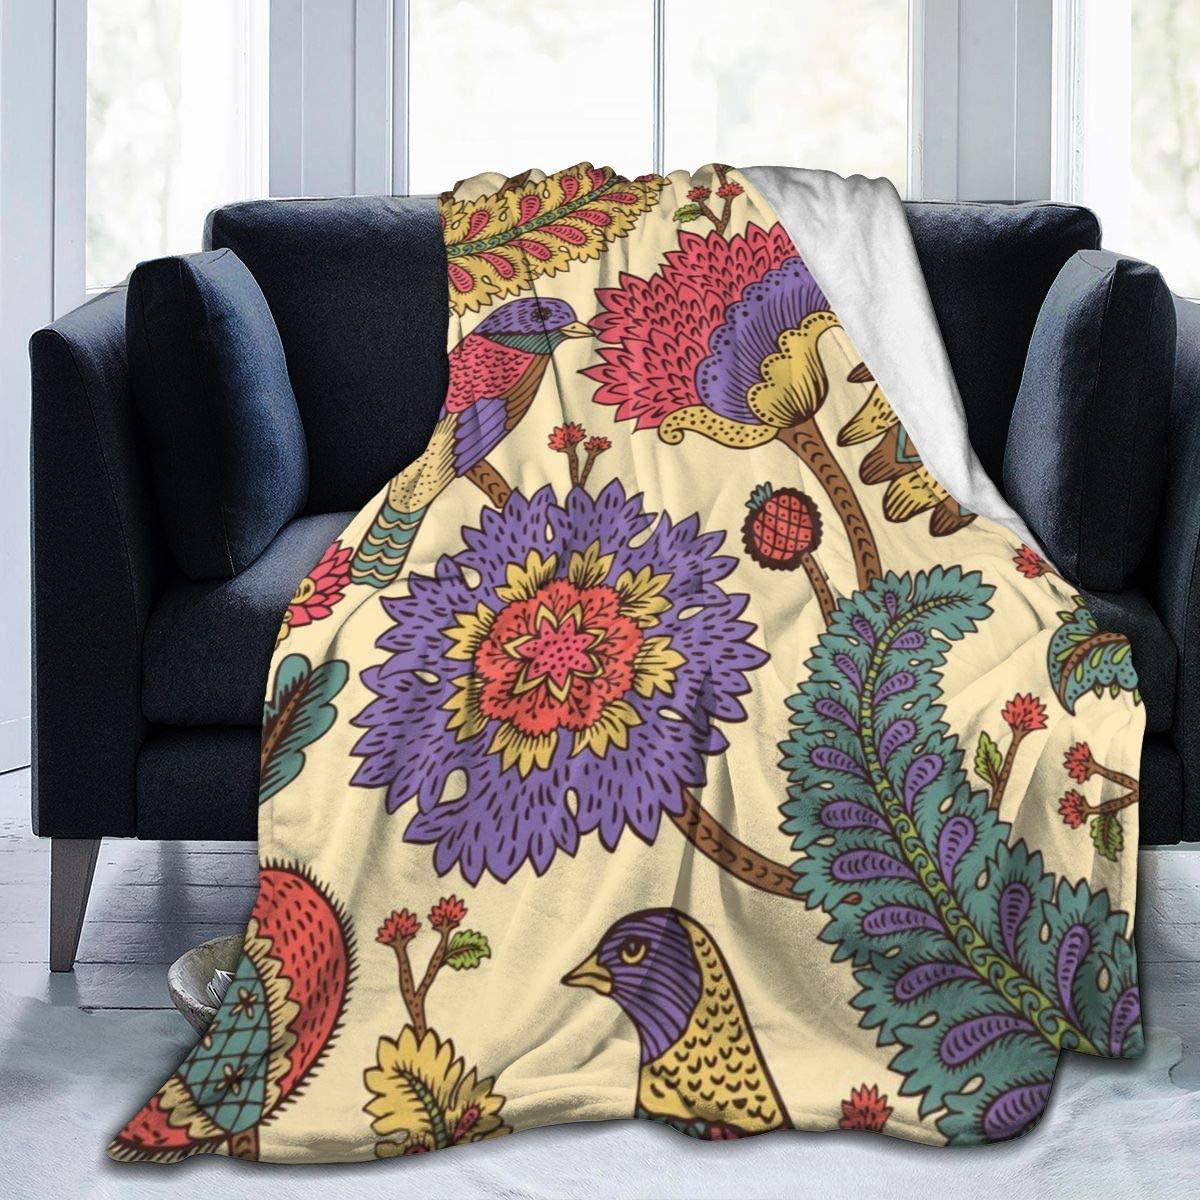 Micro Fleece Plush Soft Baby Blanket Paisley Fantasy Flowers Feather Fluffy Warm Toddler Bed/Crib Blanket Lightweight Flannel Daycare Nap Kids Sleeping Tummy Time Throw Blanket Girls Boy Kid/Baby